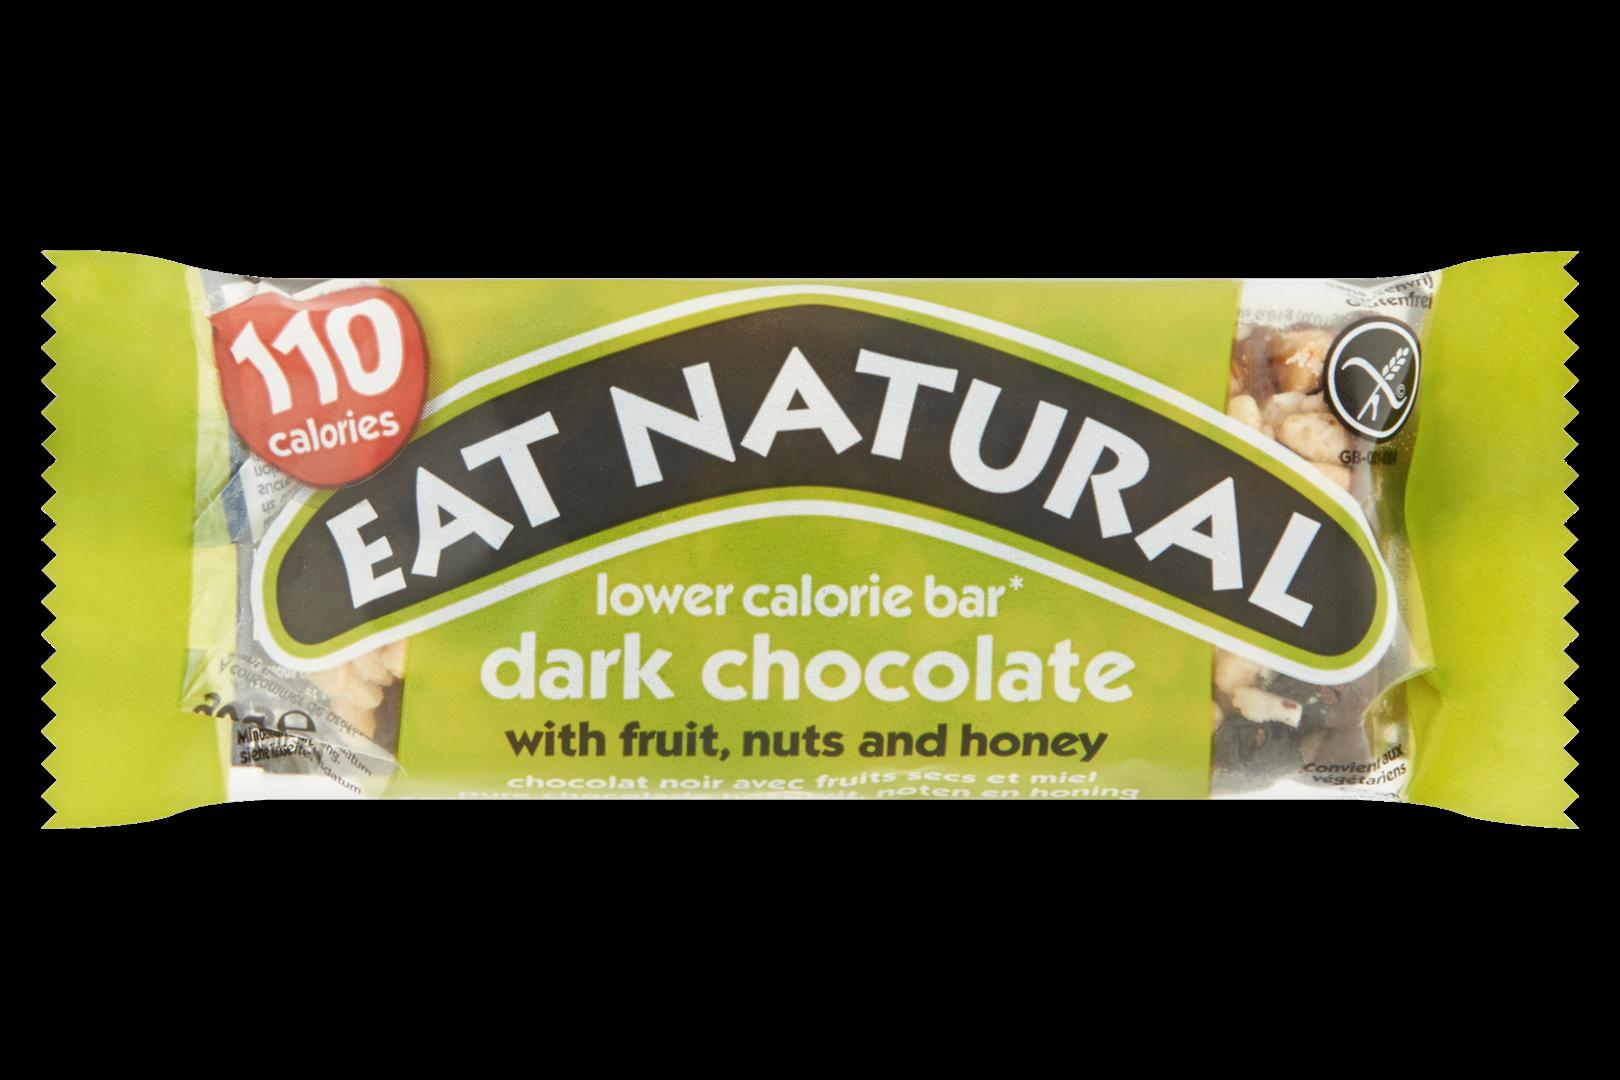 Productafbeelding Eat Natural lower calorie bar pure chocolade met fruit, noten en honing